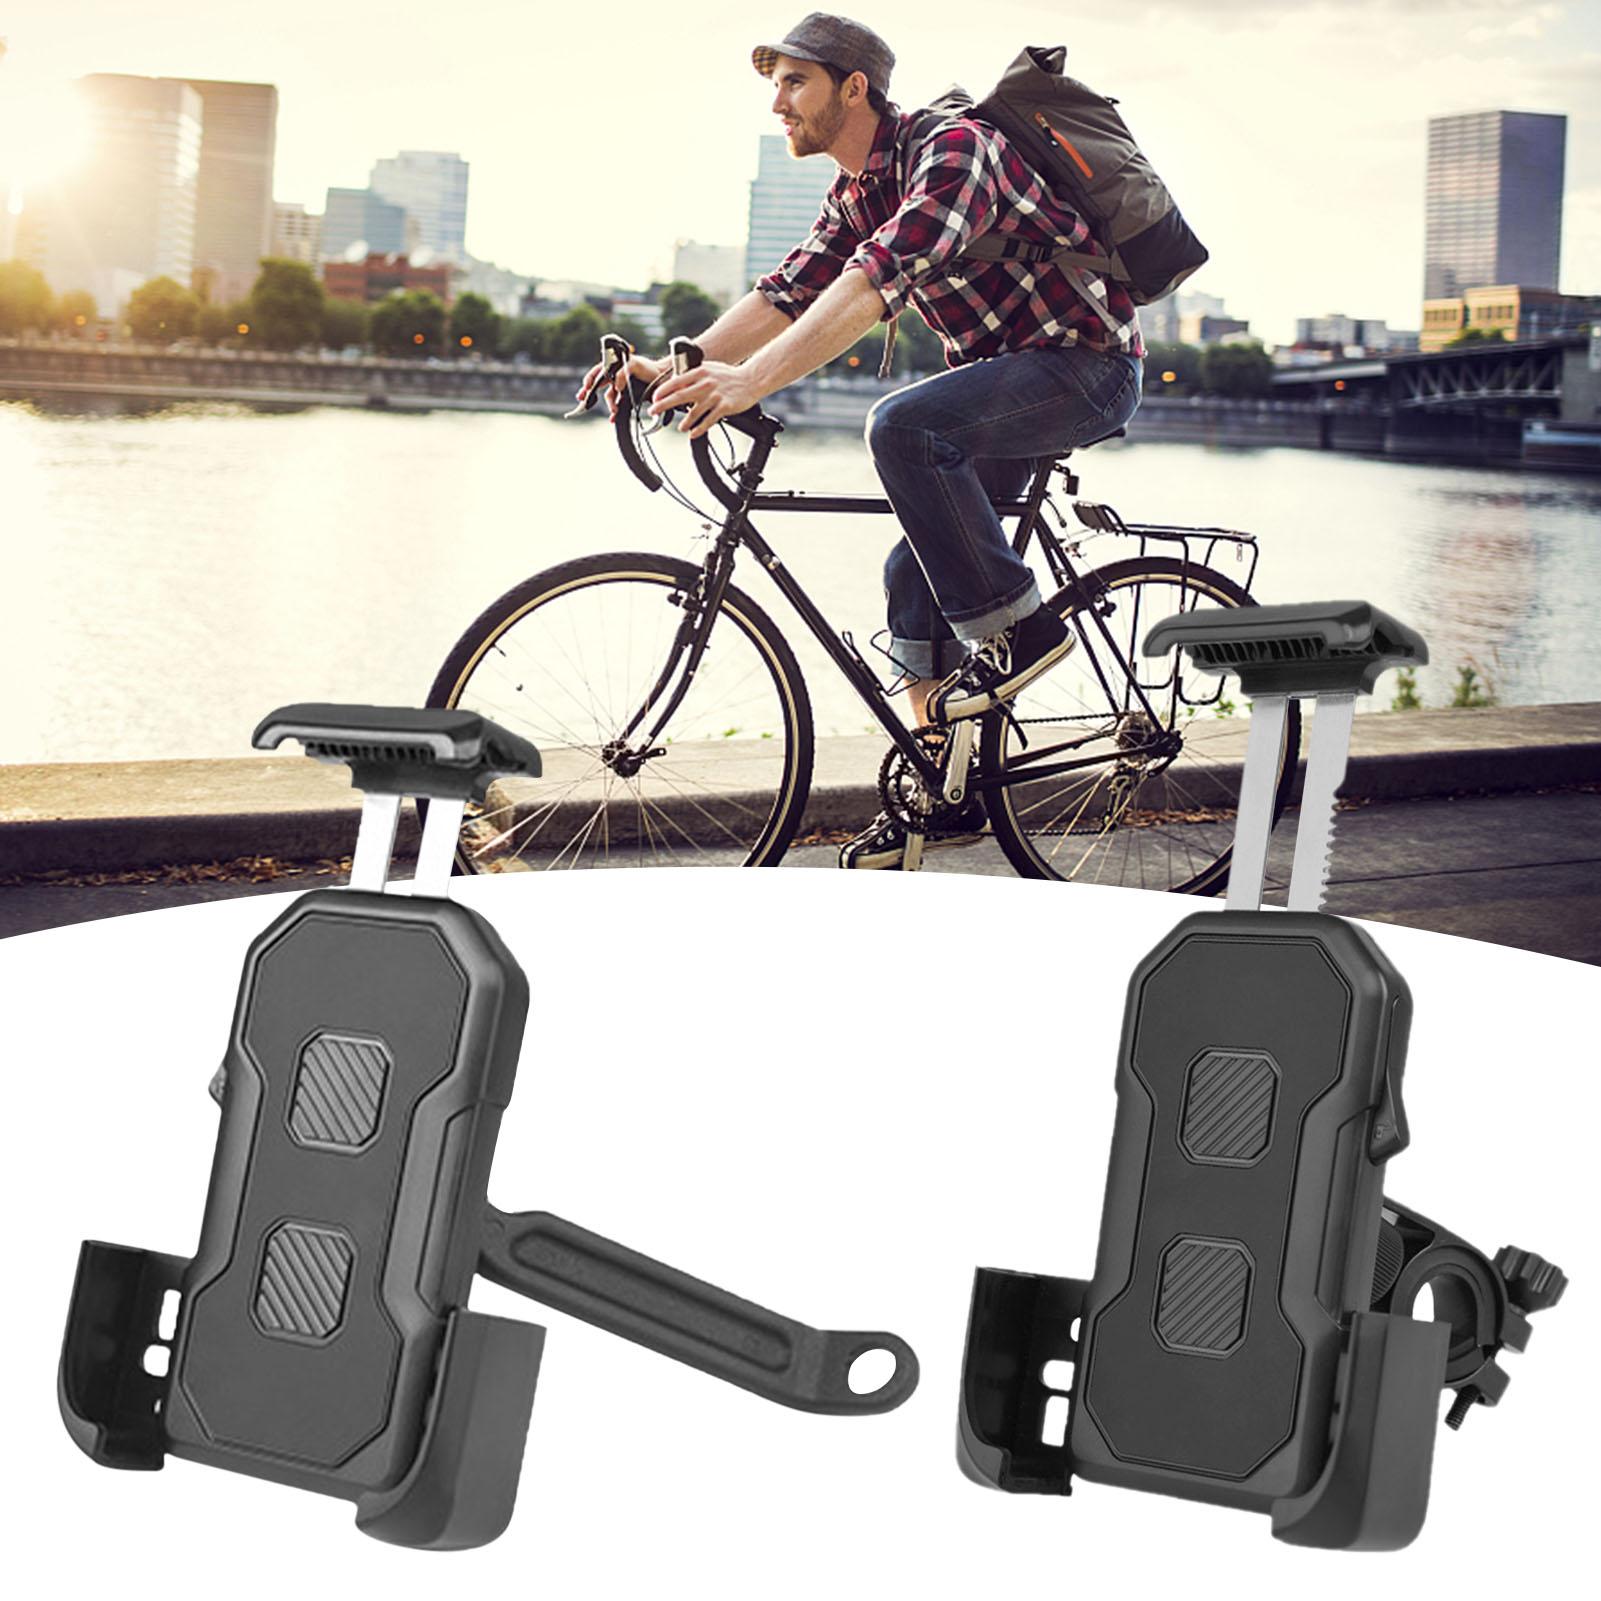 Universal Cycling Mobile Phone Holder Waterproof Bracket Adjustable Bicycle Holder MTB Cycling Phone Non-slip Bracket